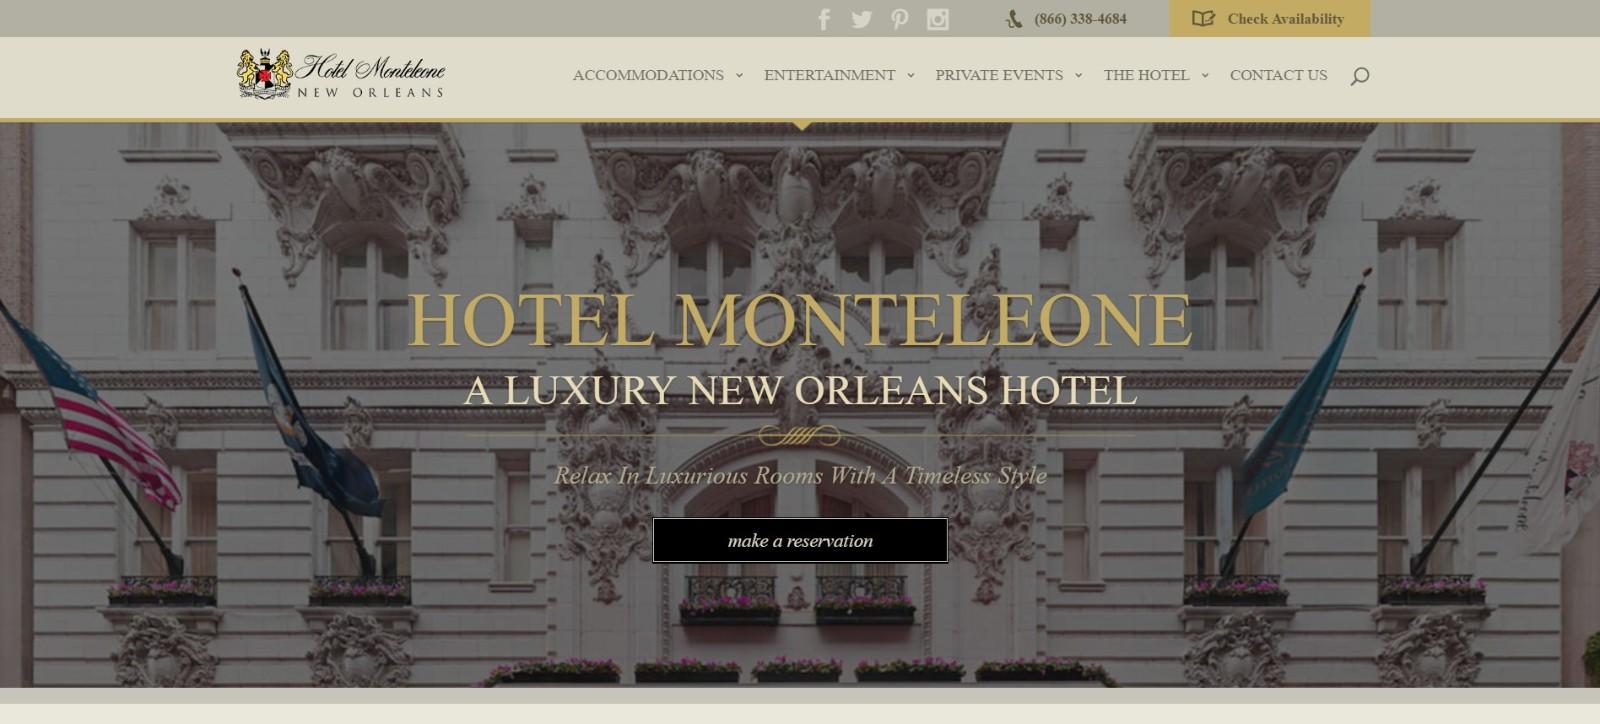 Khách sạn Monteleone